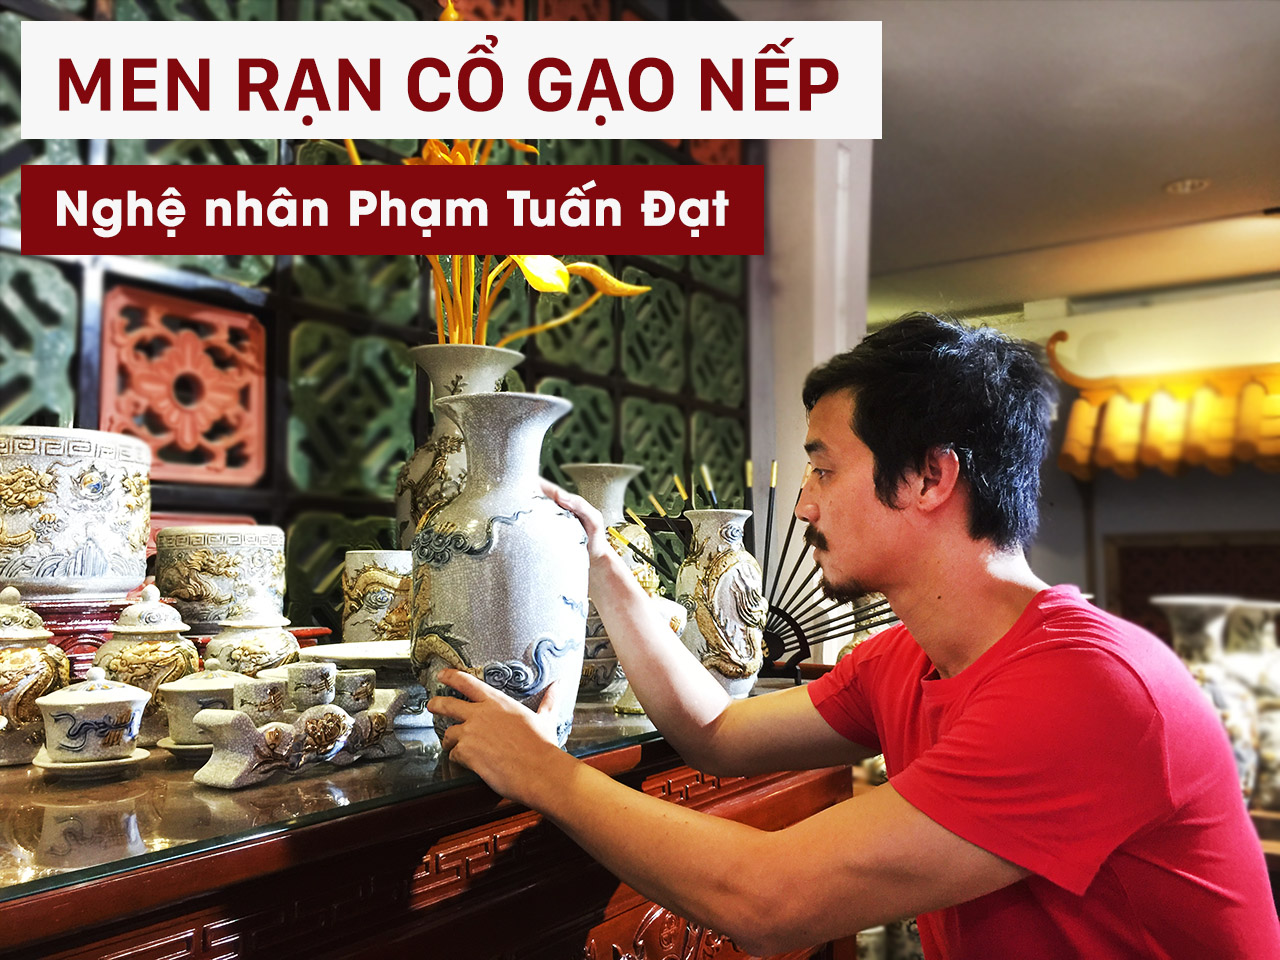 Men ran co gao nep Nghe nhan Pham Tuan Dat gom su Hai Long Bat Trang